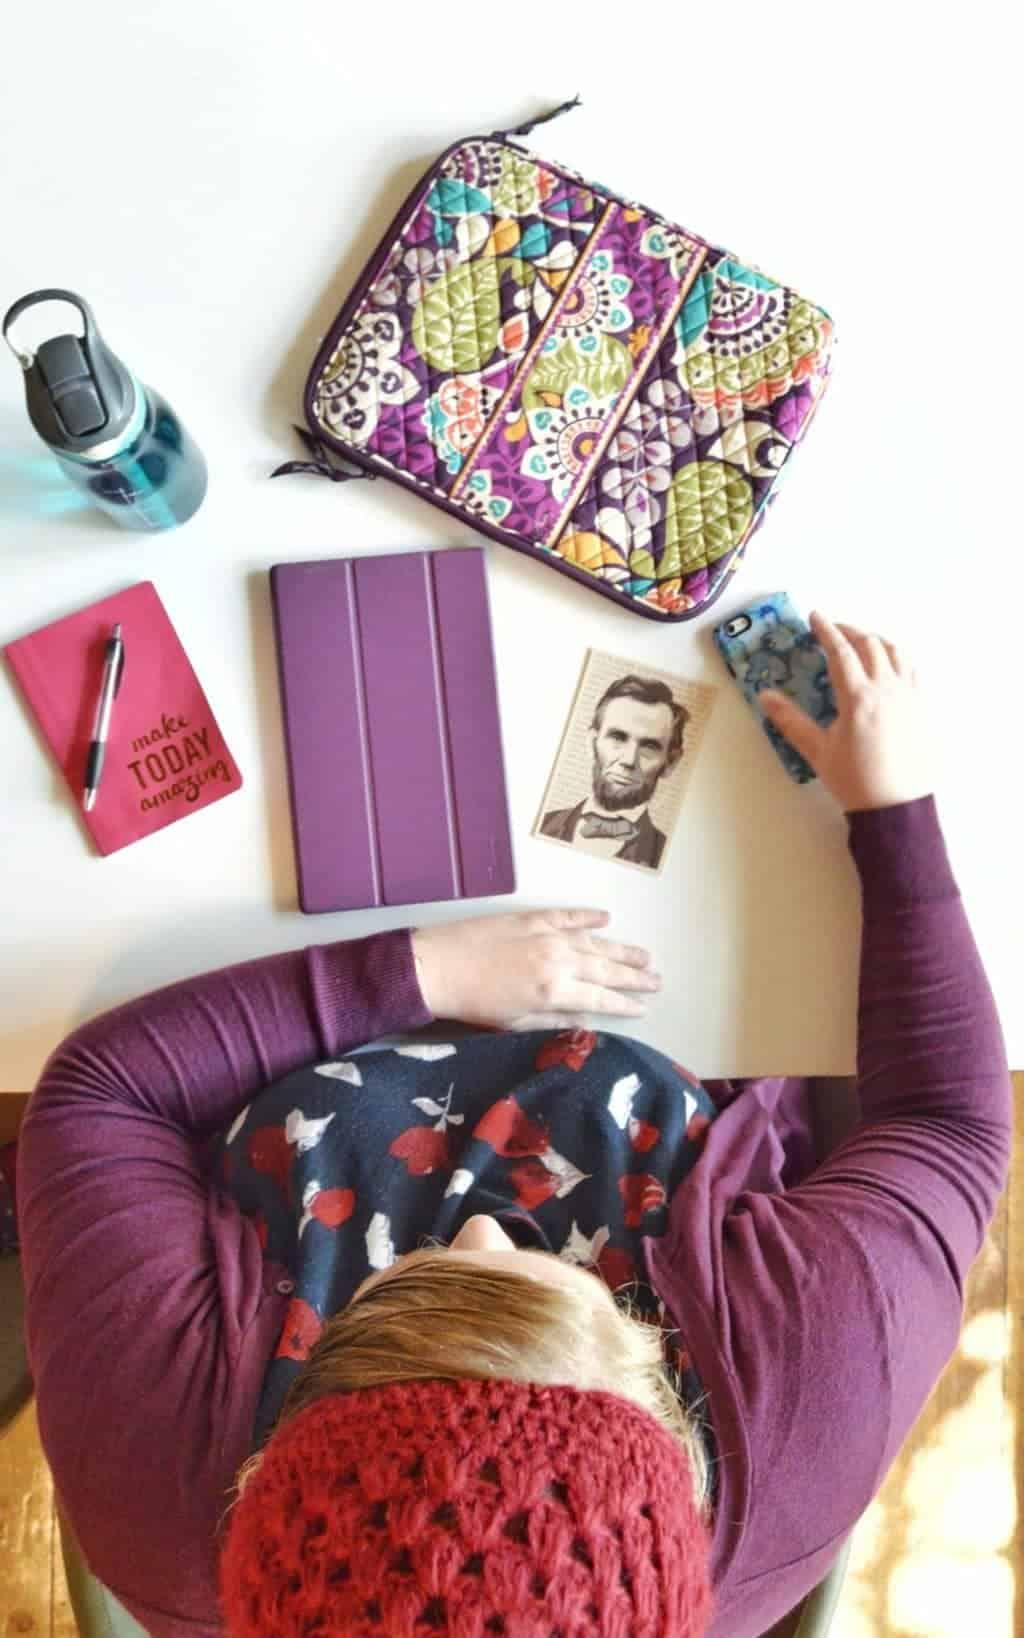 5 Ways to Enrich Your College Life (Featuring Amazon Underground)